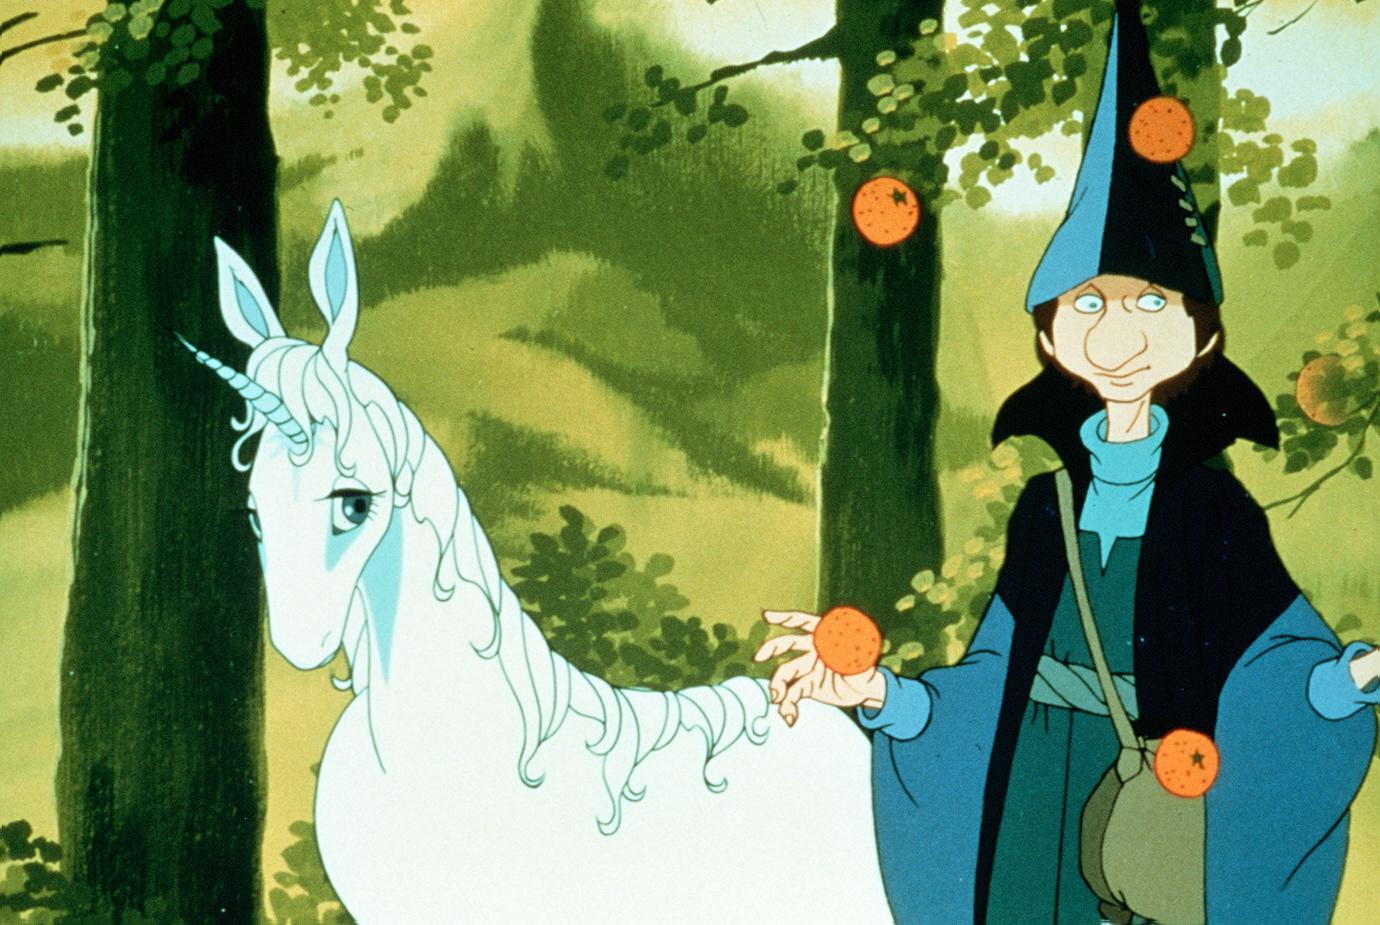 مشاهدة فيلم The Last Unicorn 1982 HD مترجم كامل اون لاين